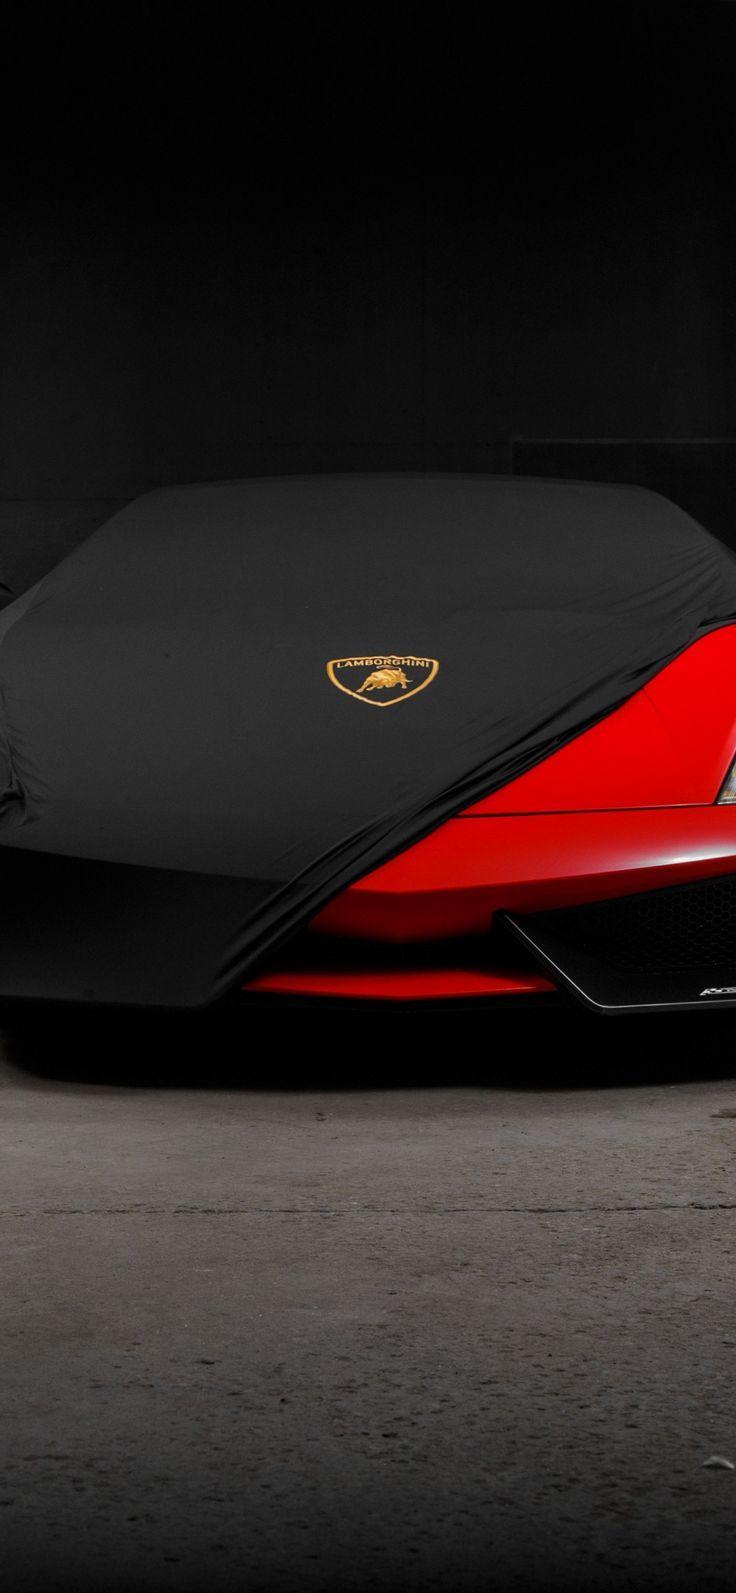 Lamborghini , HD Wallpaper & Backgrounds